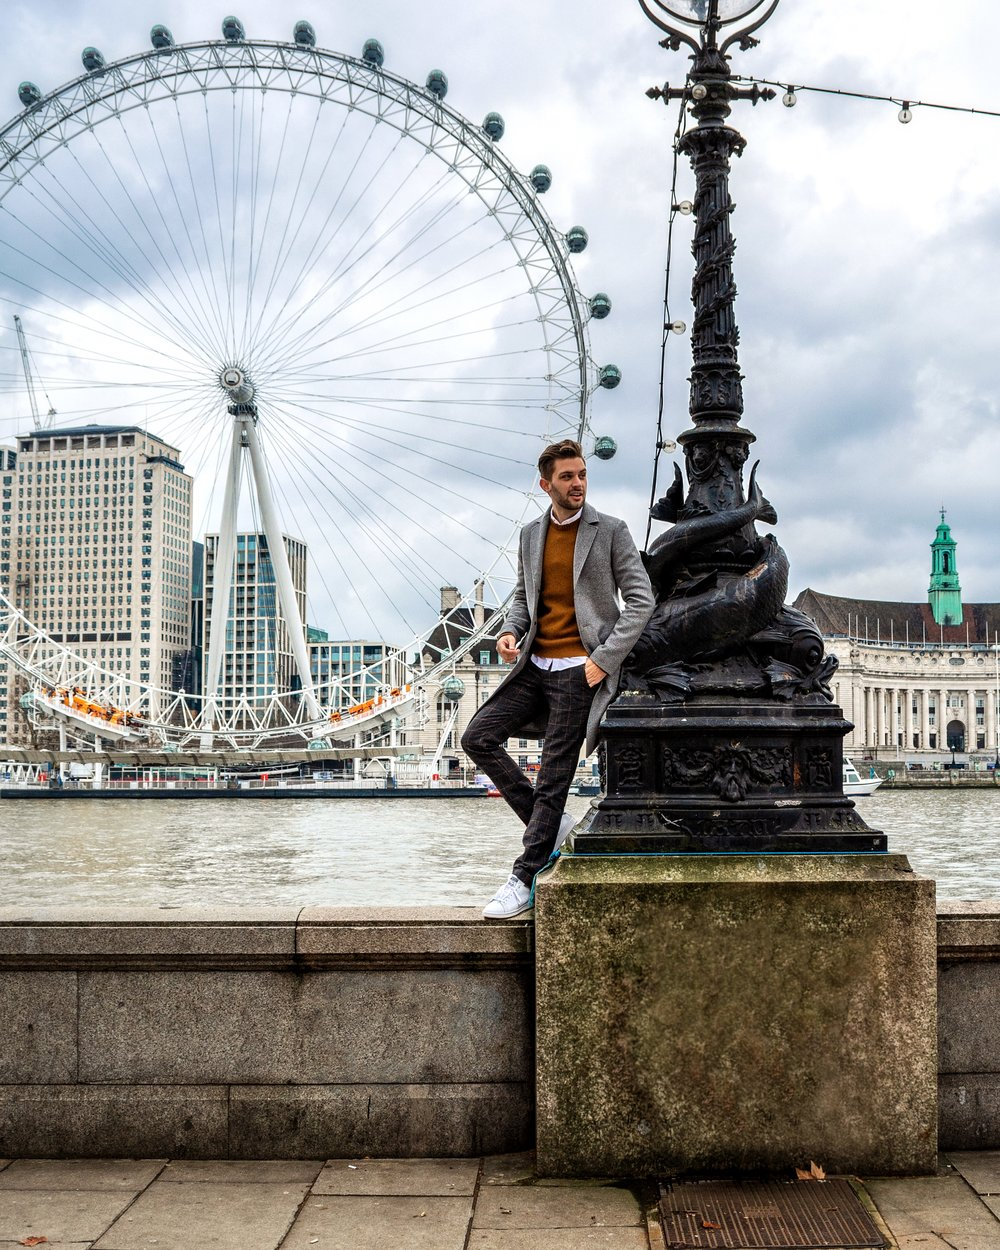 London Eye #EyeLoveLondon | The Modern Otter